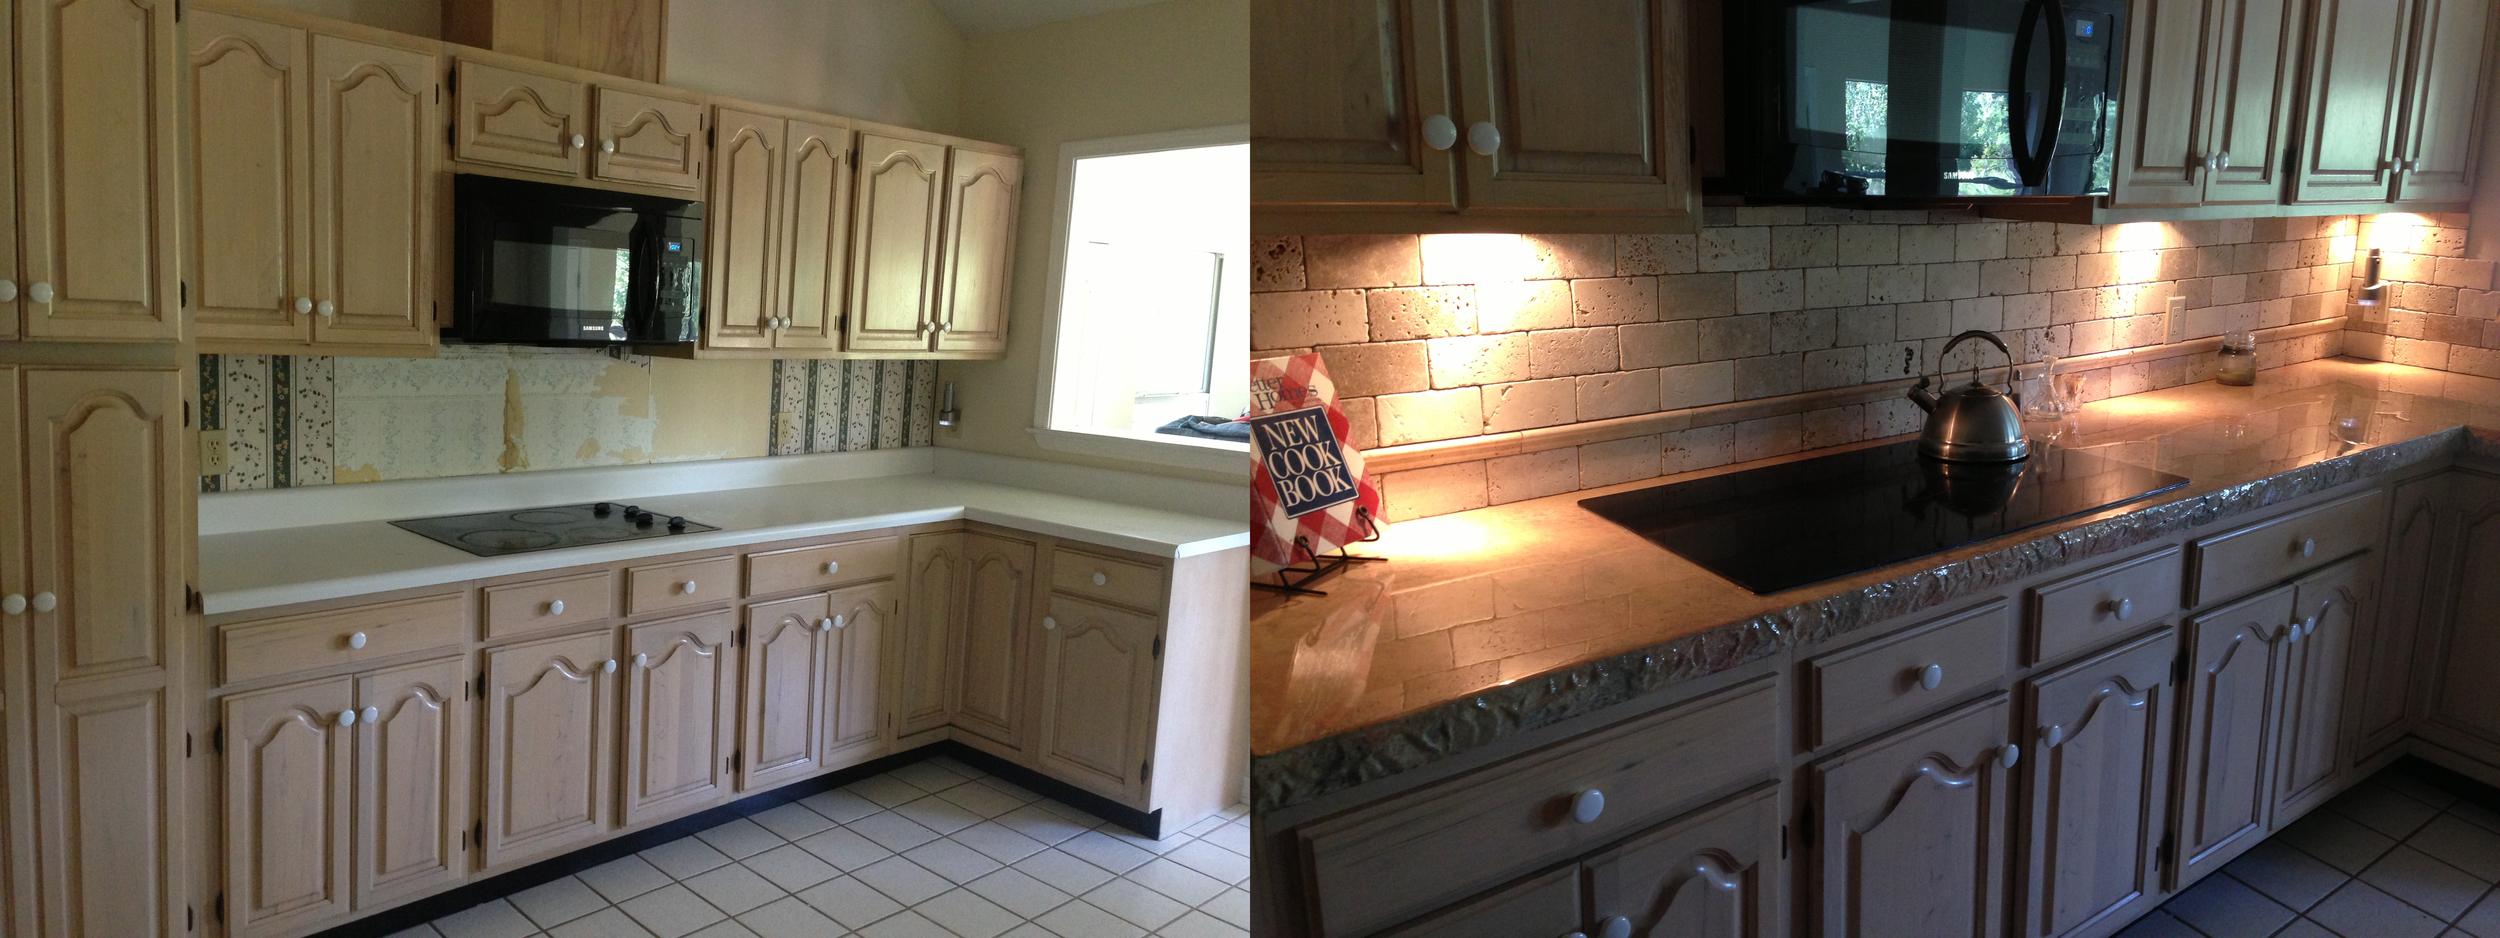 Baybrook-kitchen-(B4)-(2).jpg